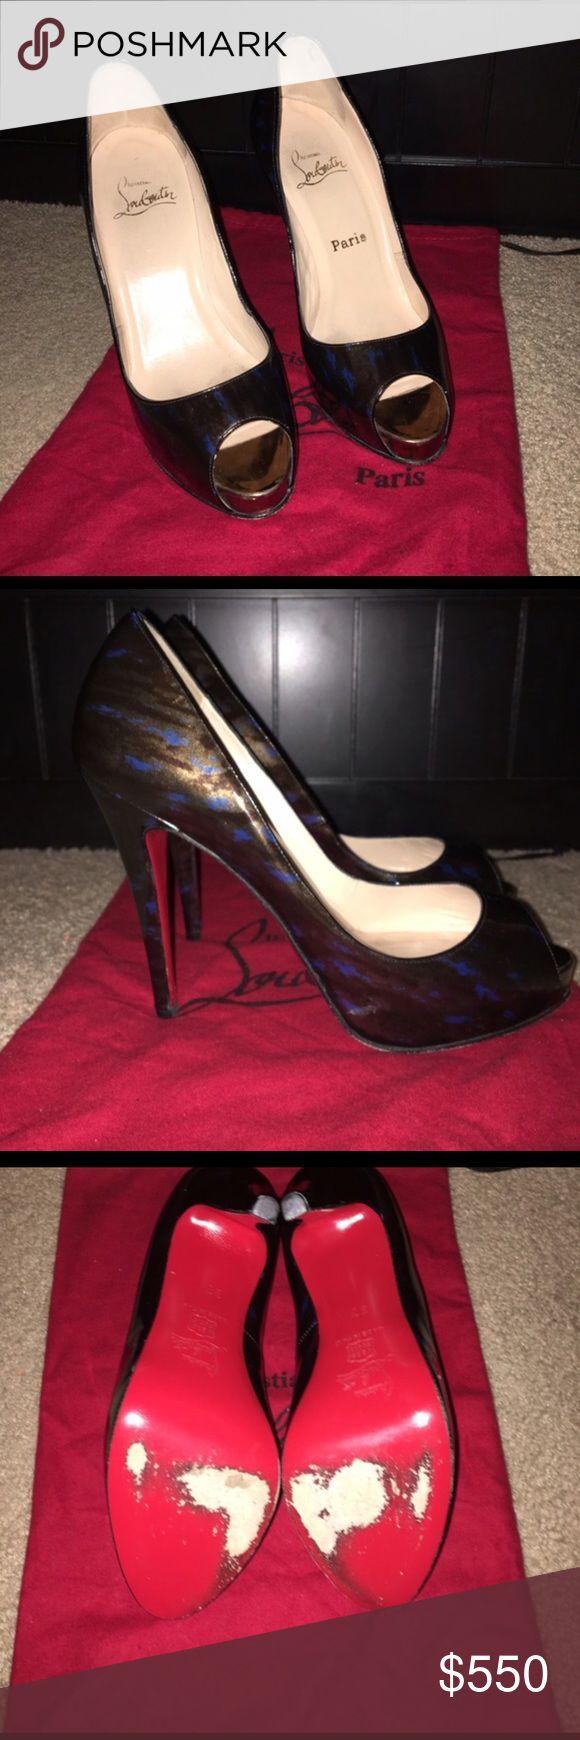 AUTHENTIC Christian Louboutin pumps. AUTHENTIC Christian Louboutin pumps. Used. NO TRADES Christian Louboutin Shoes Heels